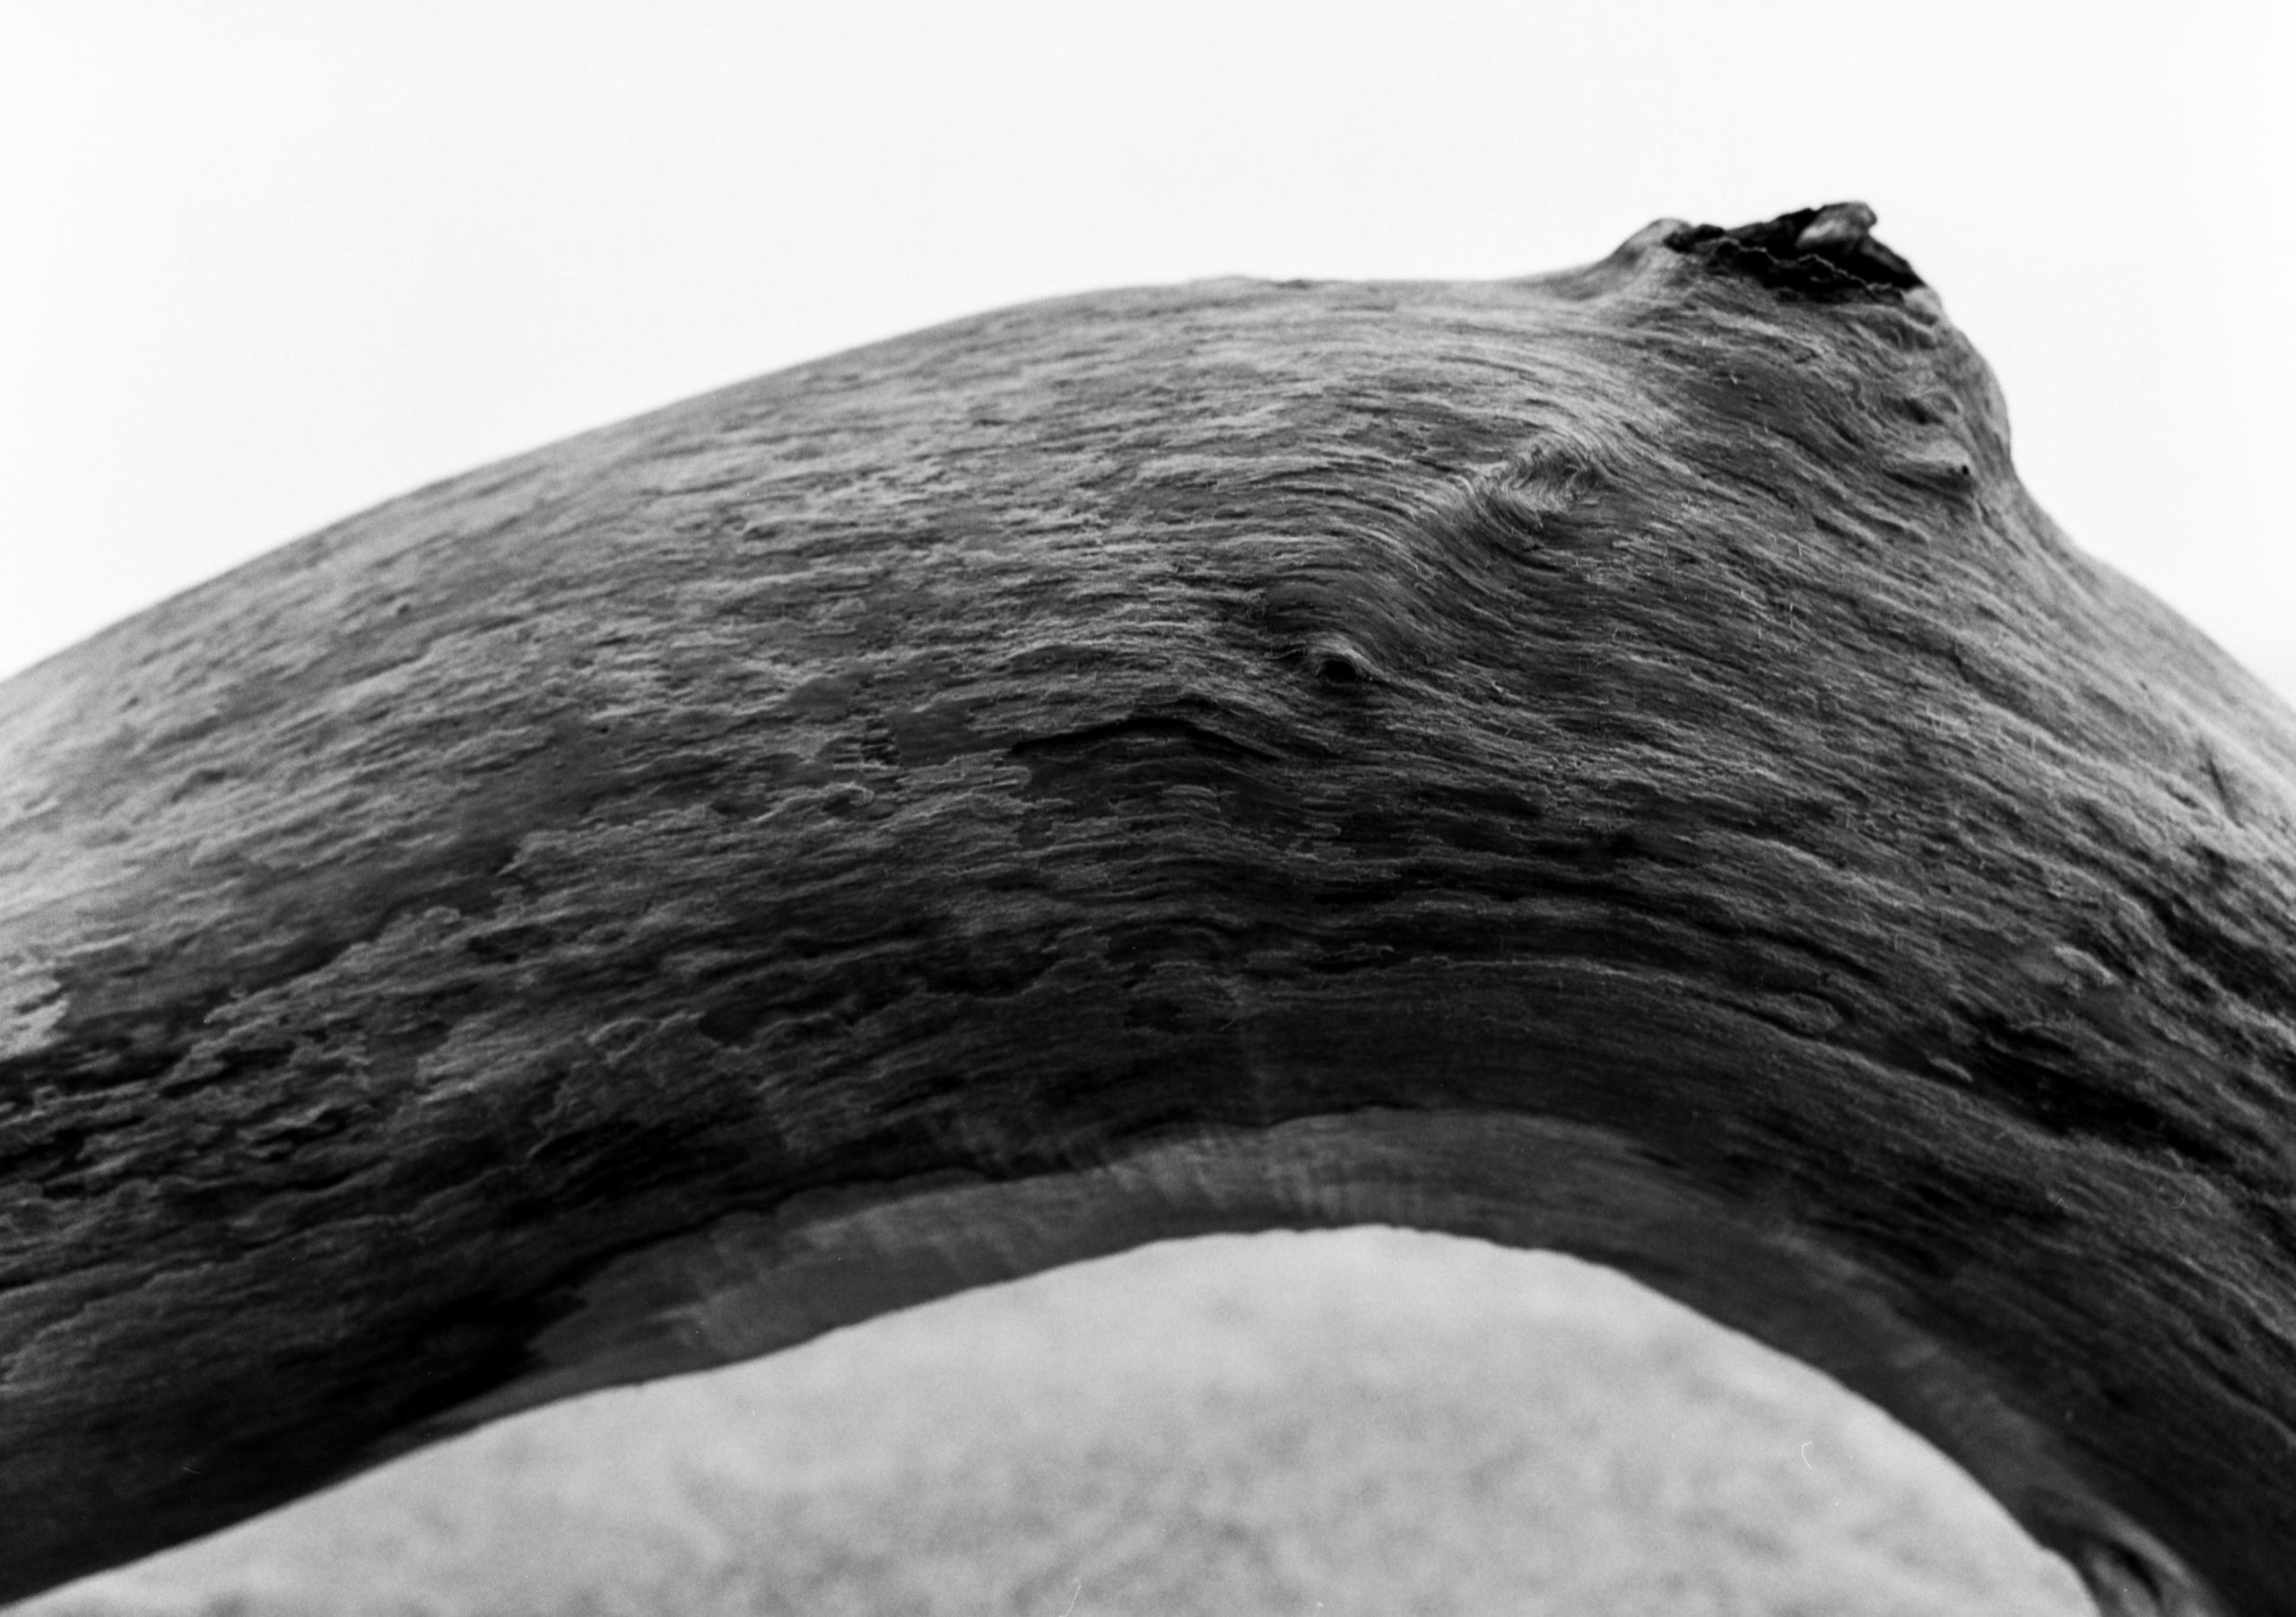 Driftwood - mediumformat, ilfordfilm - junwin | ello